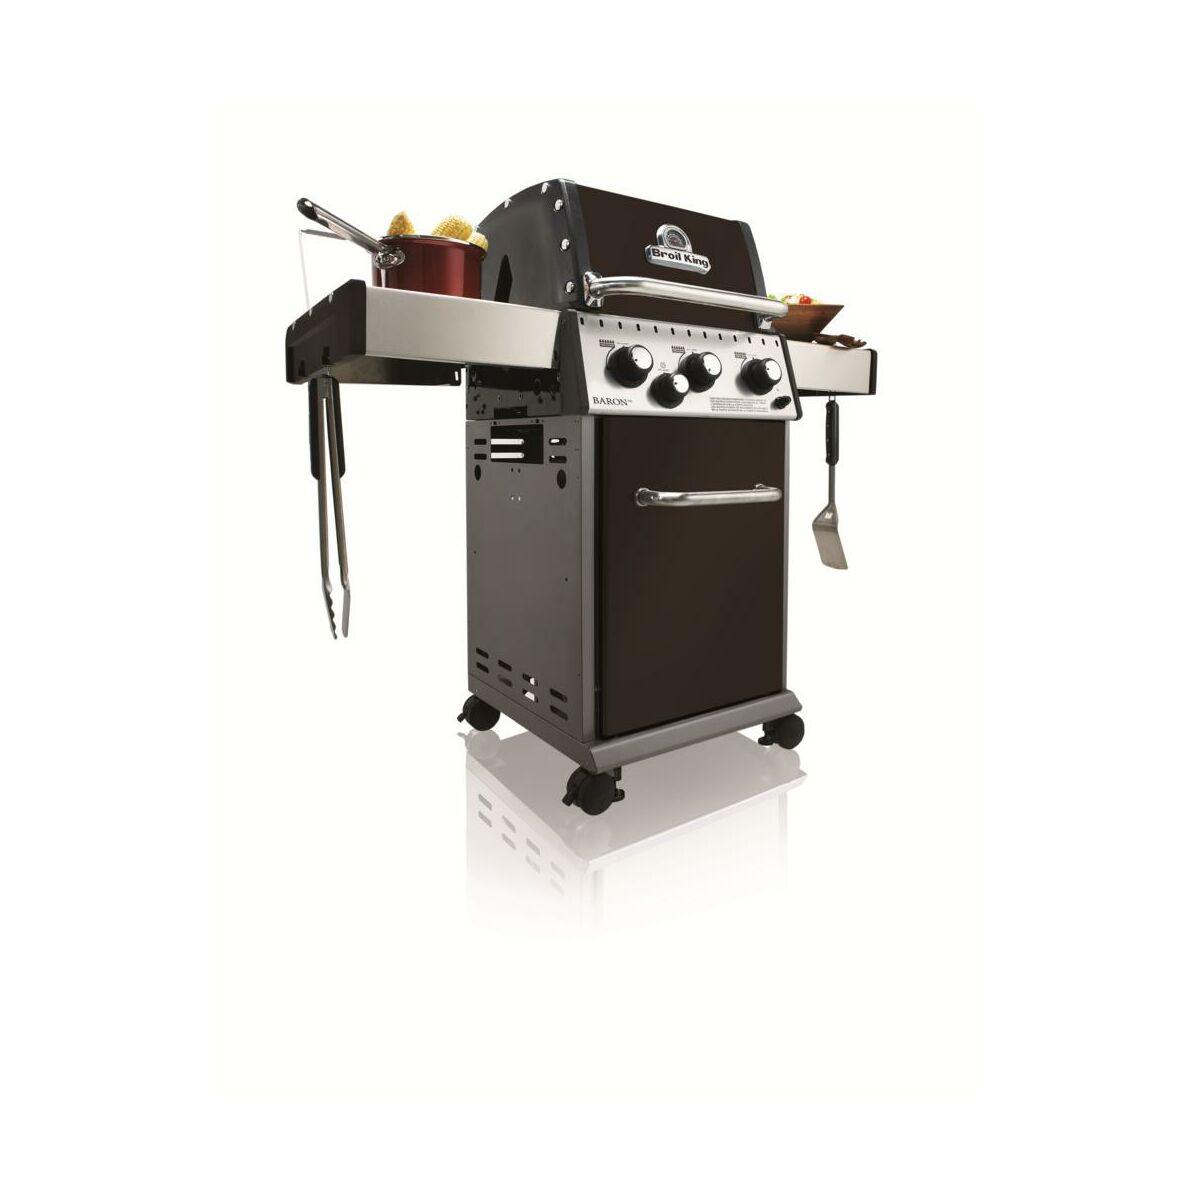 Grill gazowy baron 340 broil king grille w glowe gazowe - Grille barbecue leroy merlin ...